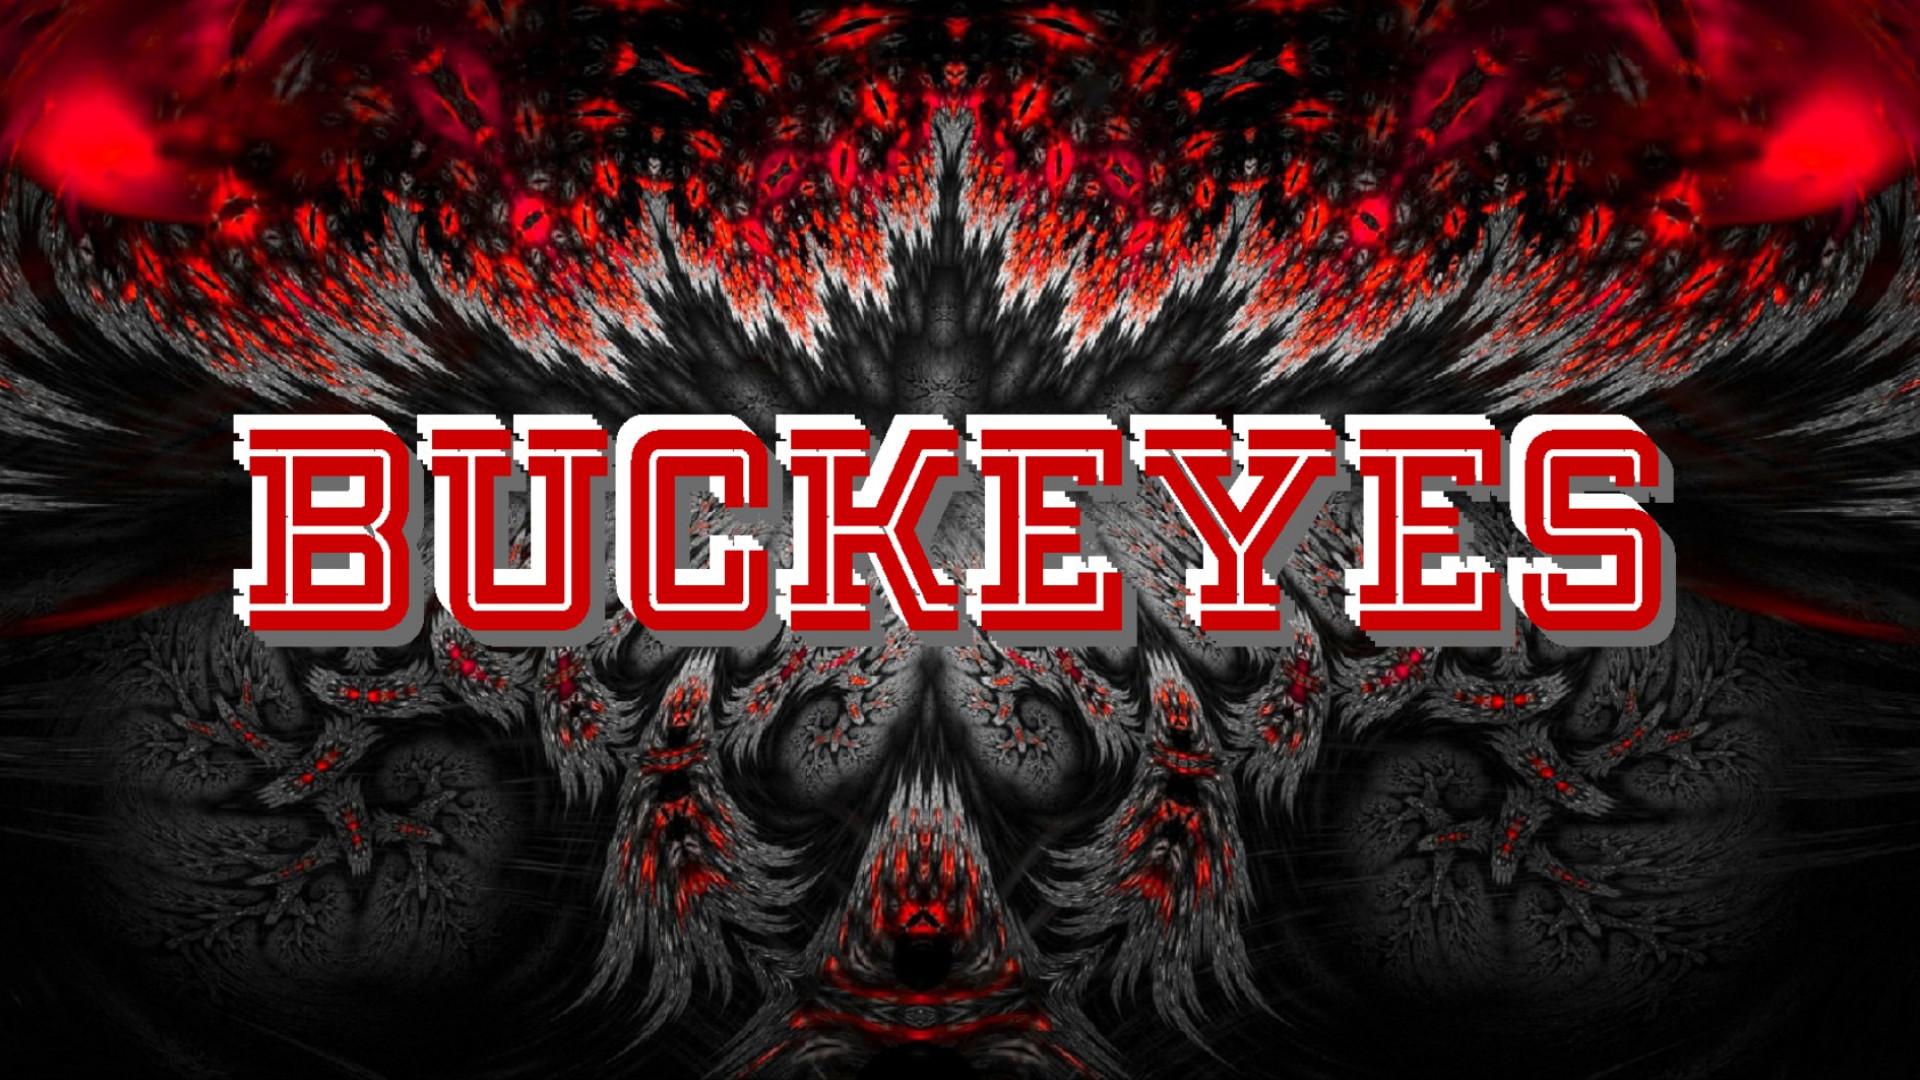 Ohio State Buckeyes Wallpaper (76+